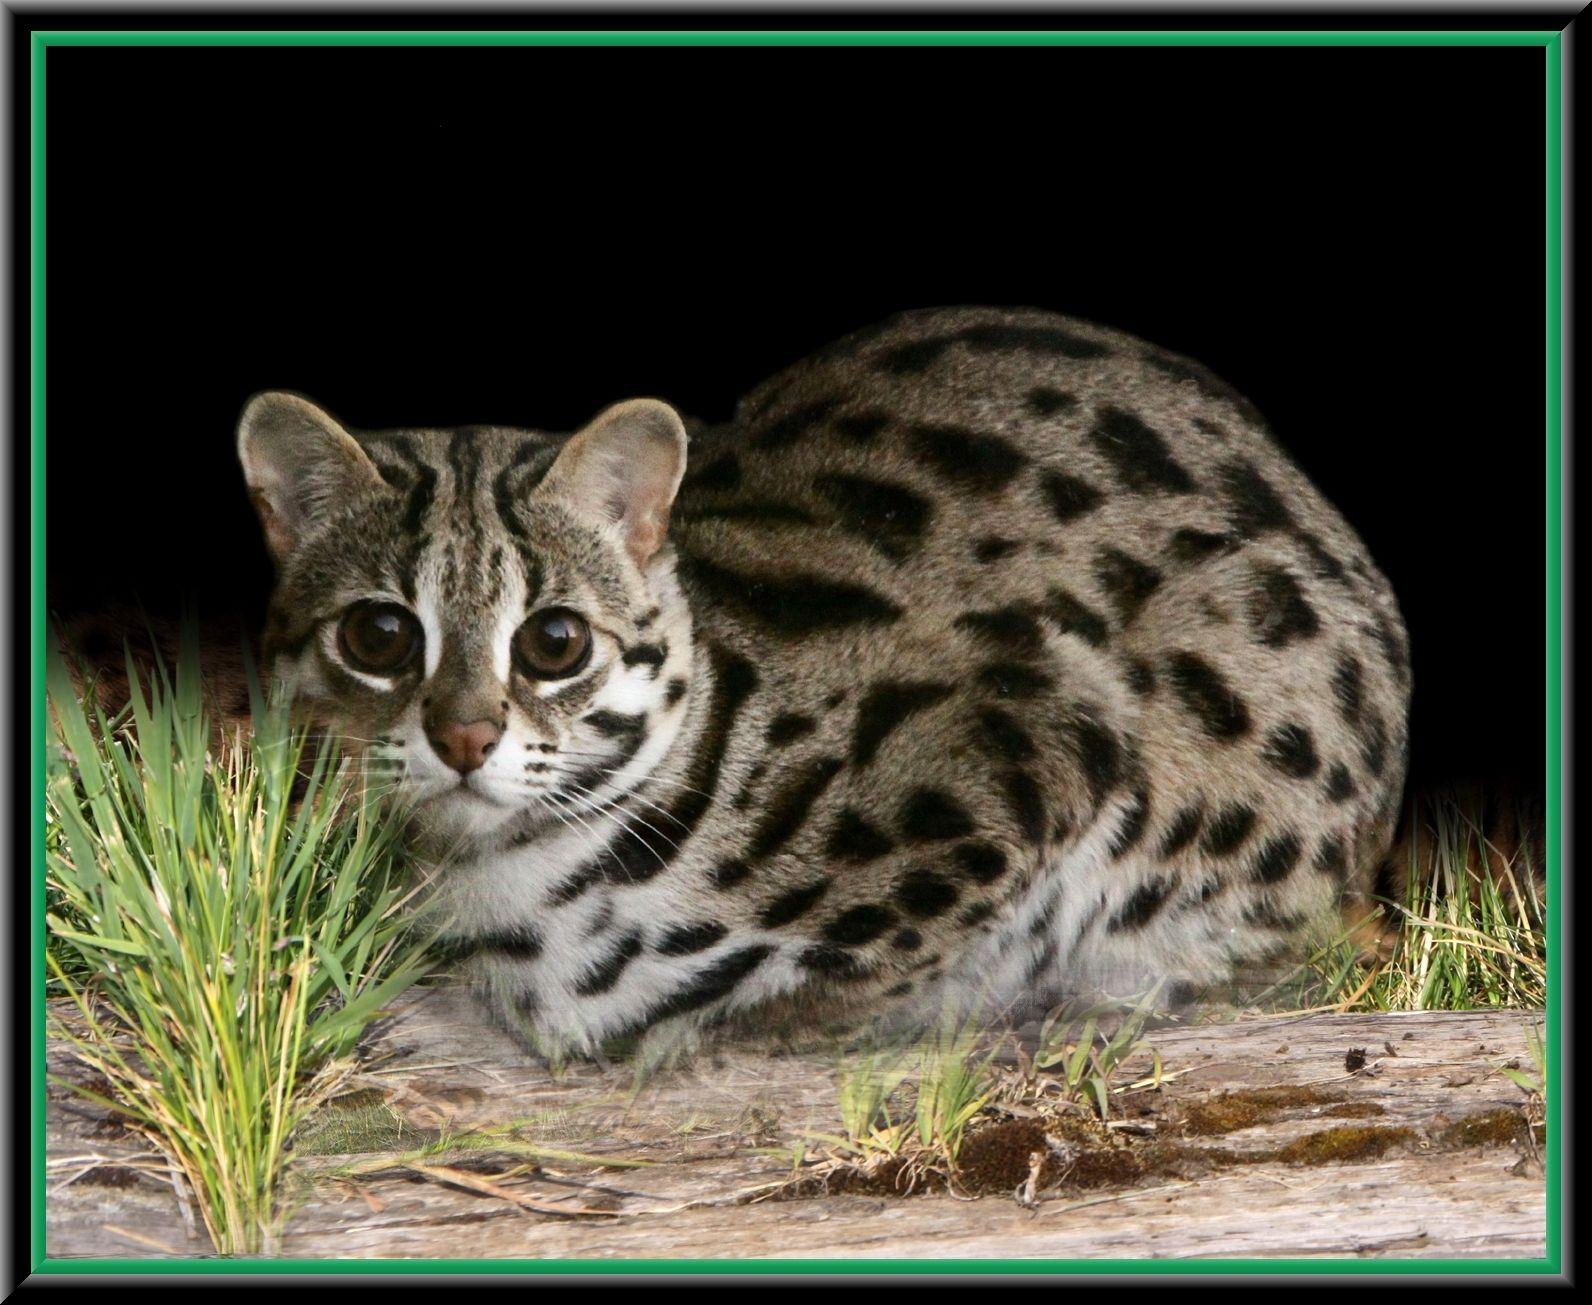 Asian Leopard Cat Asian Leopard Cat Bengal Cat Small Wild Cats